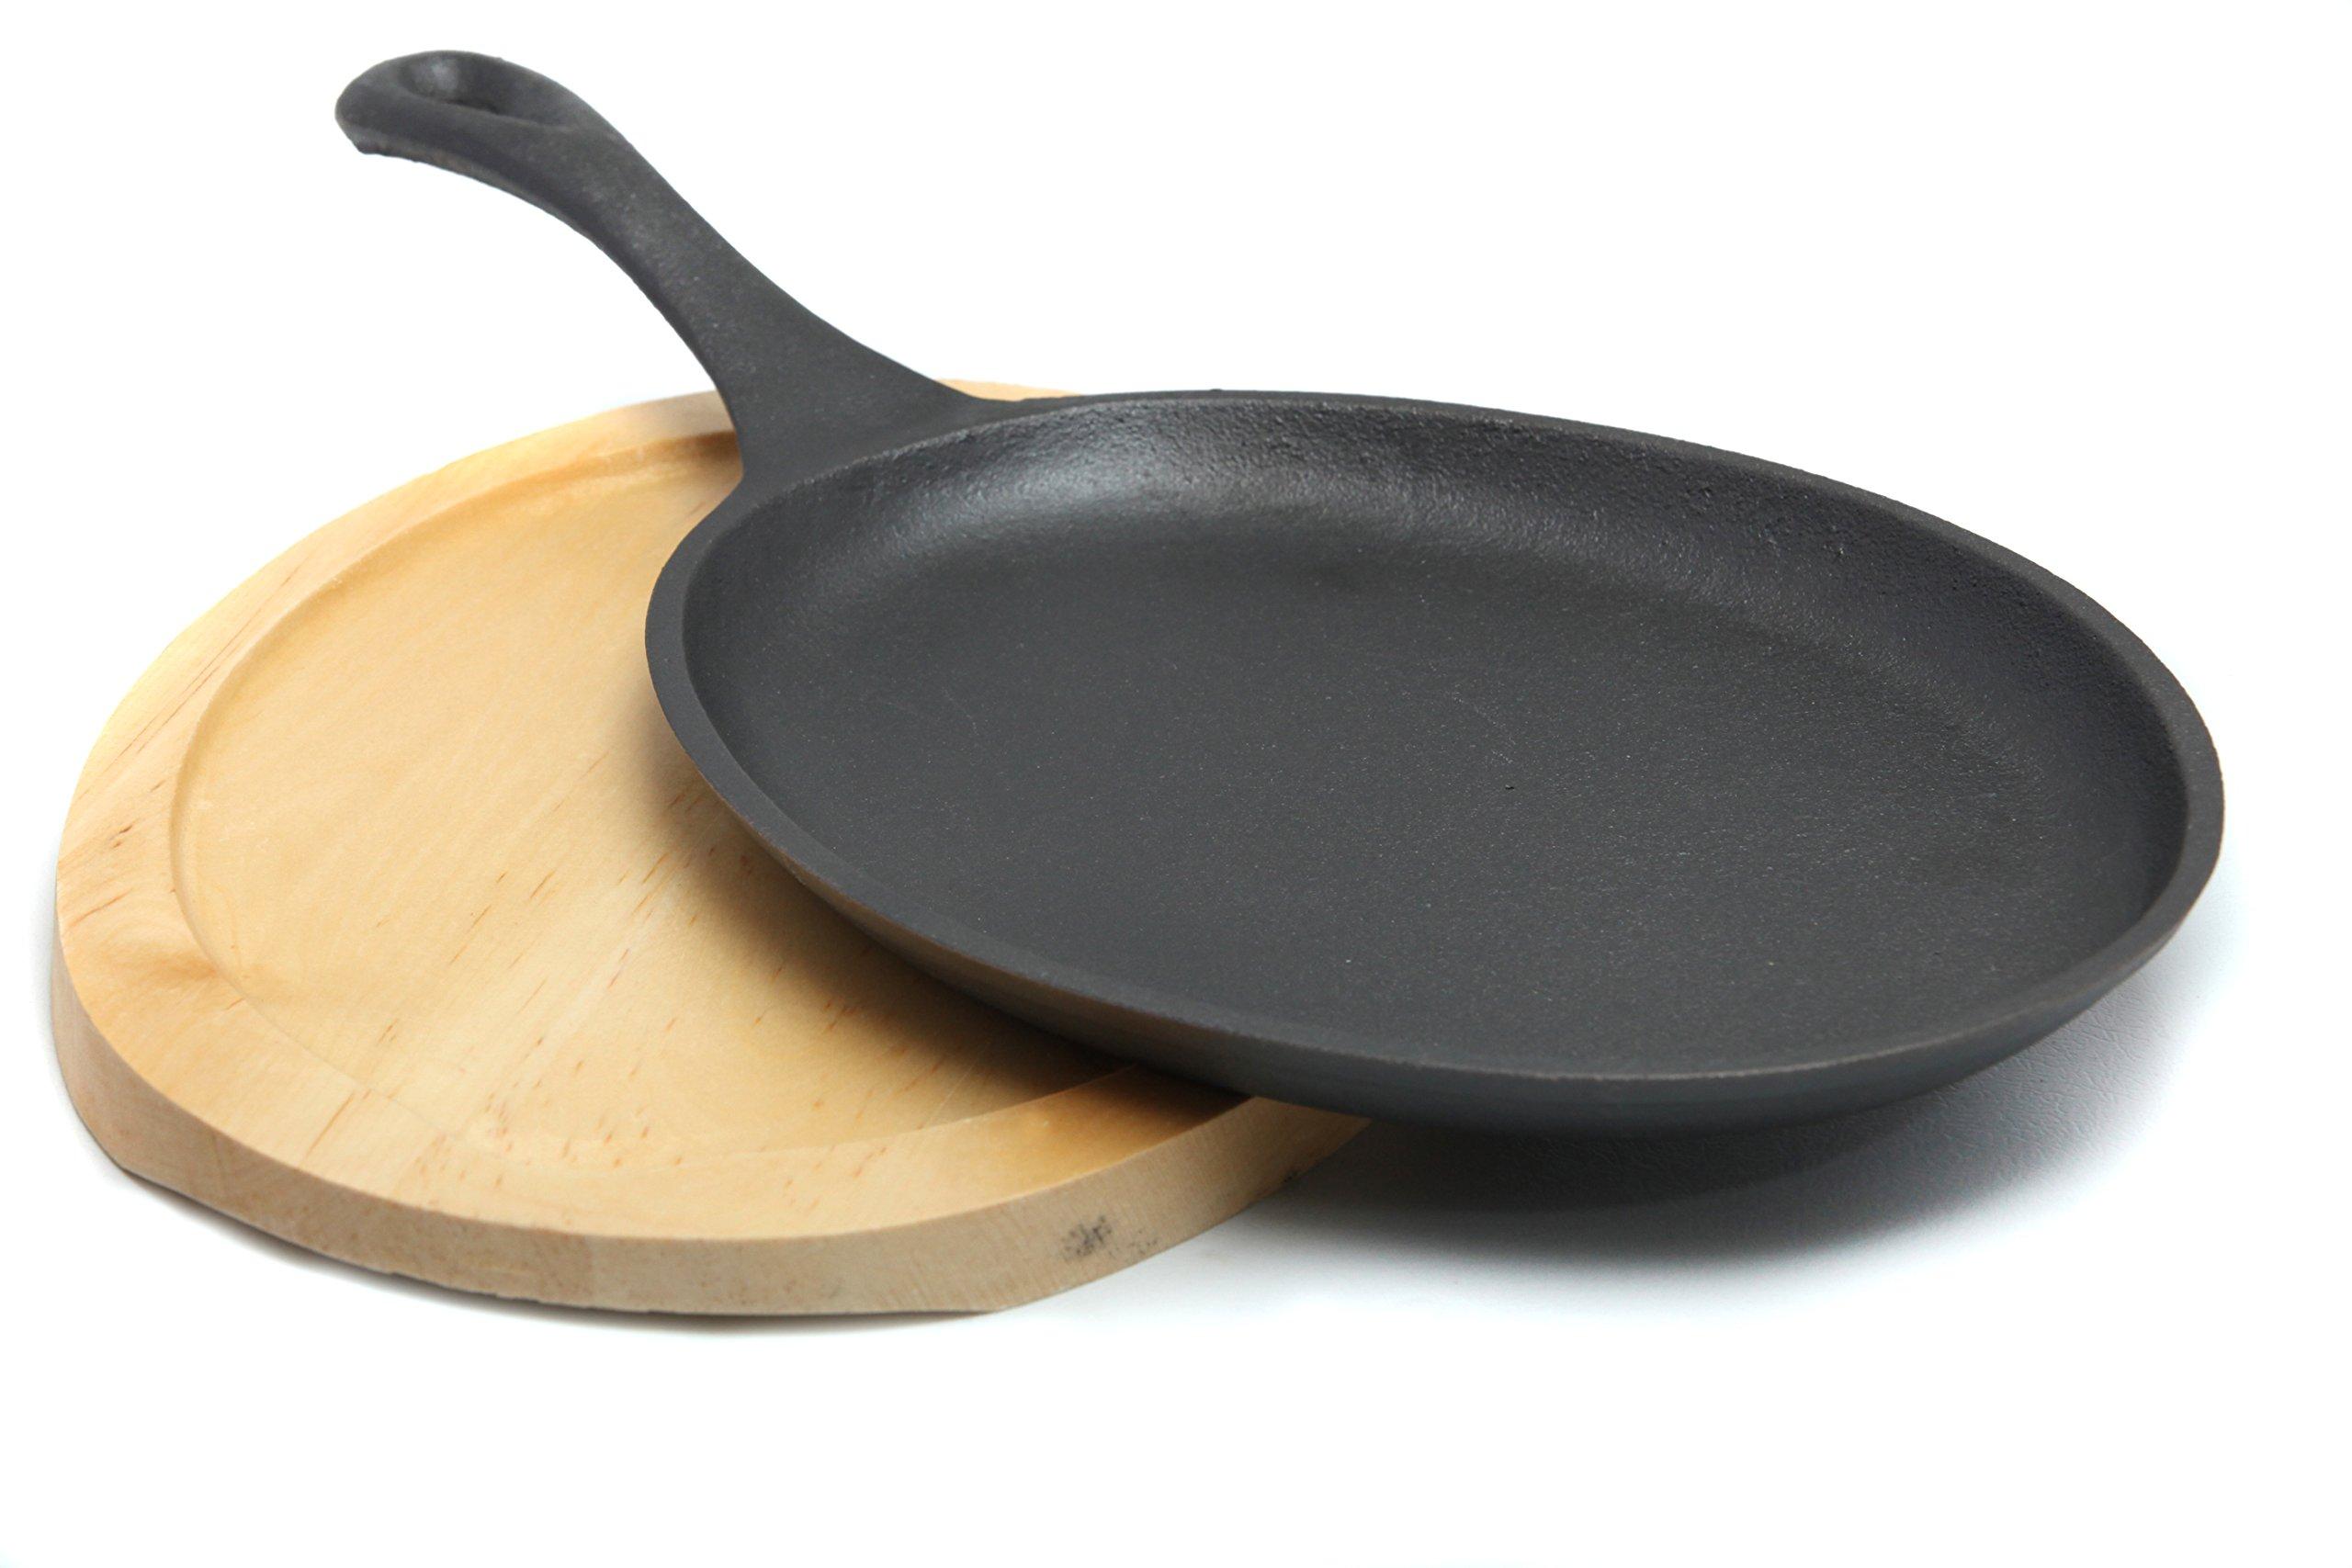 GURO Pre-Seasoned Cast Iron Fajita Pan with Wooden Tray